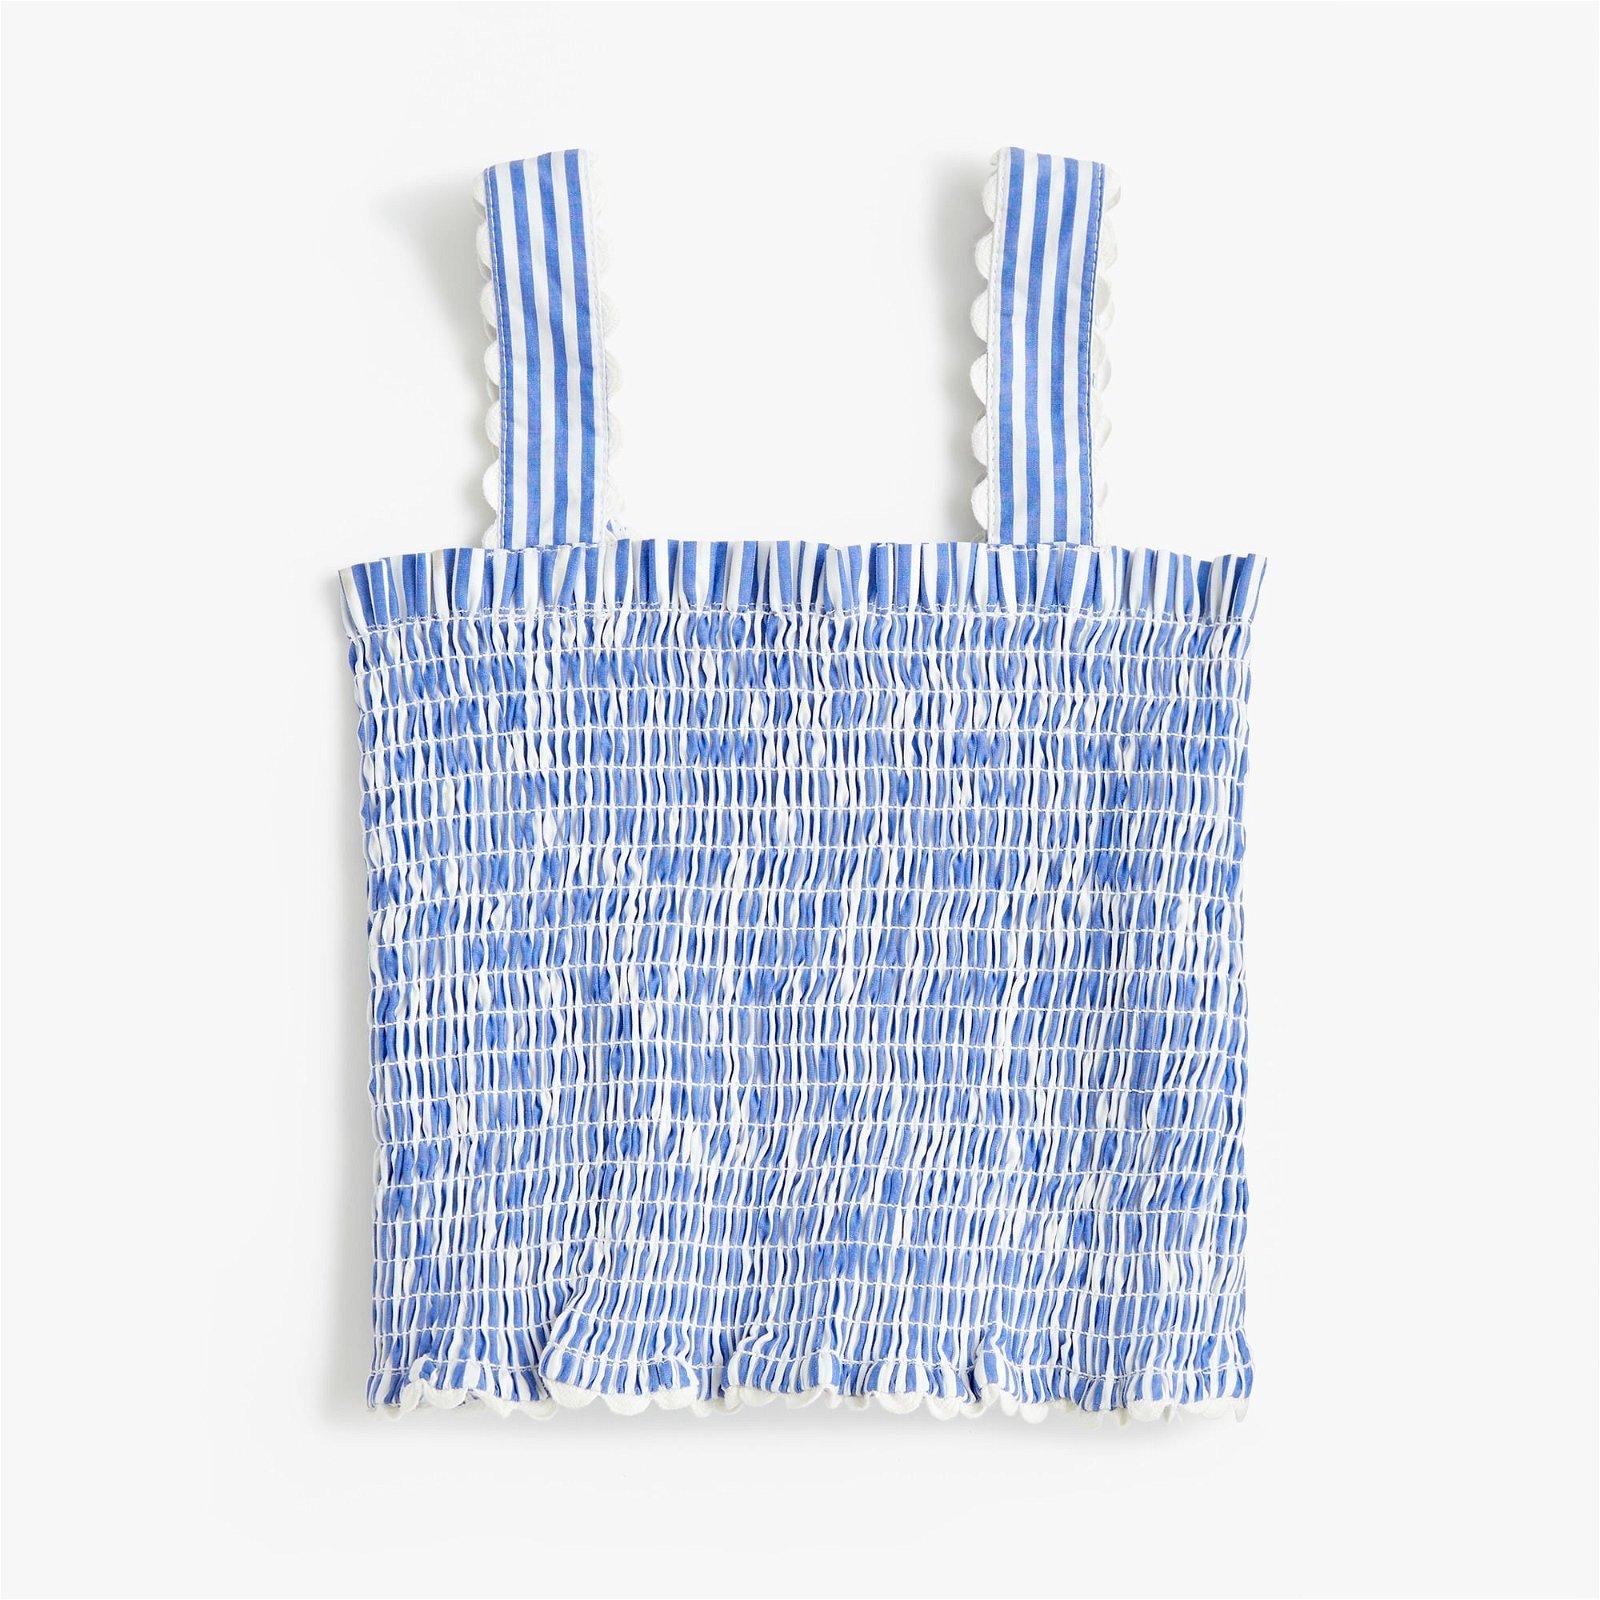 Loeffler Randall® by Clementine X Girls' crewcuts smocked tank top